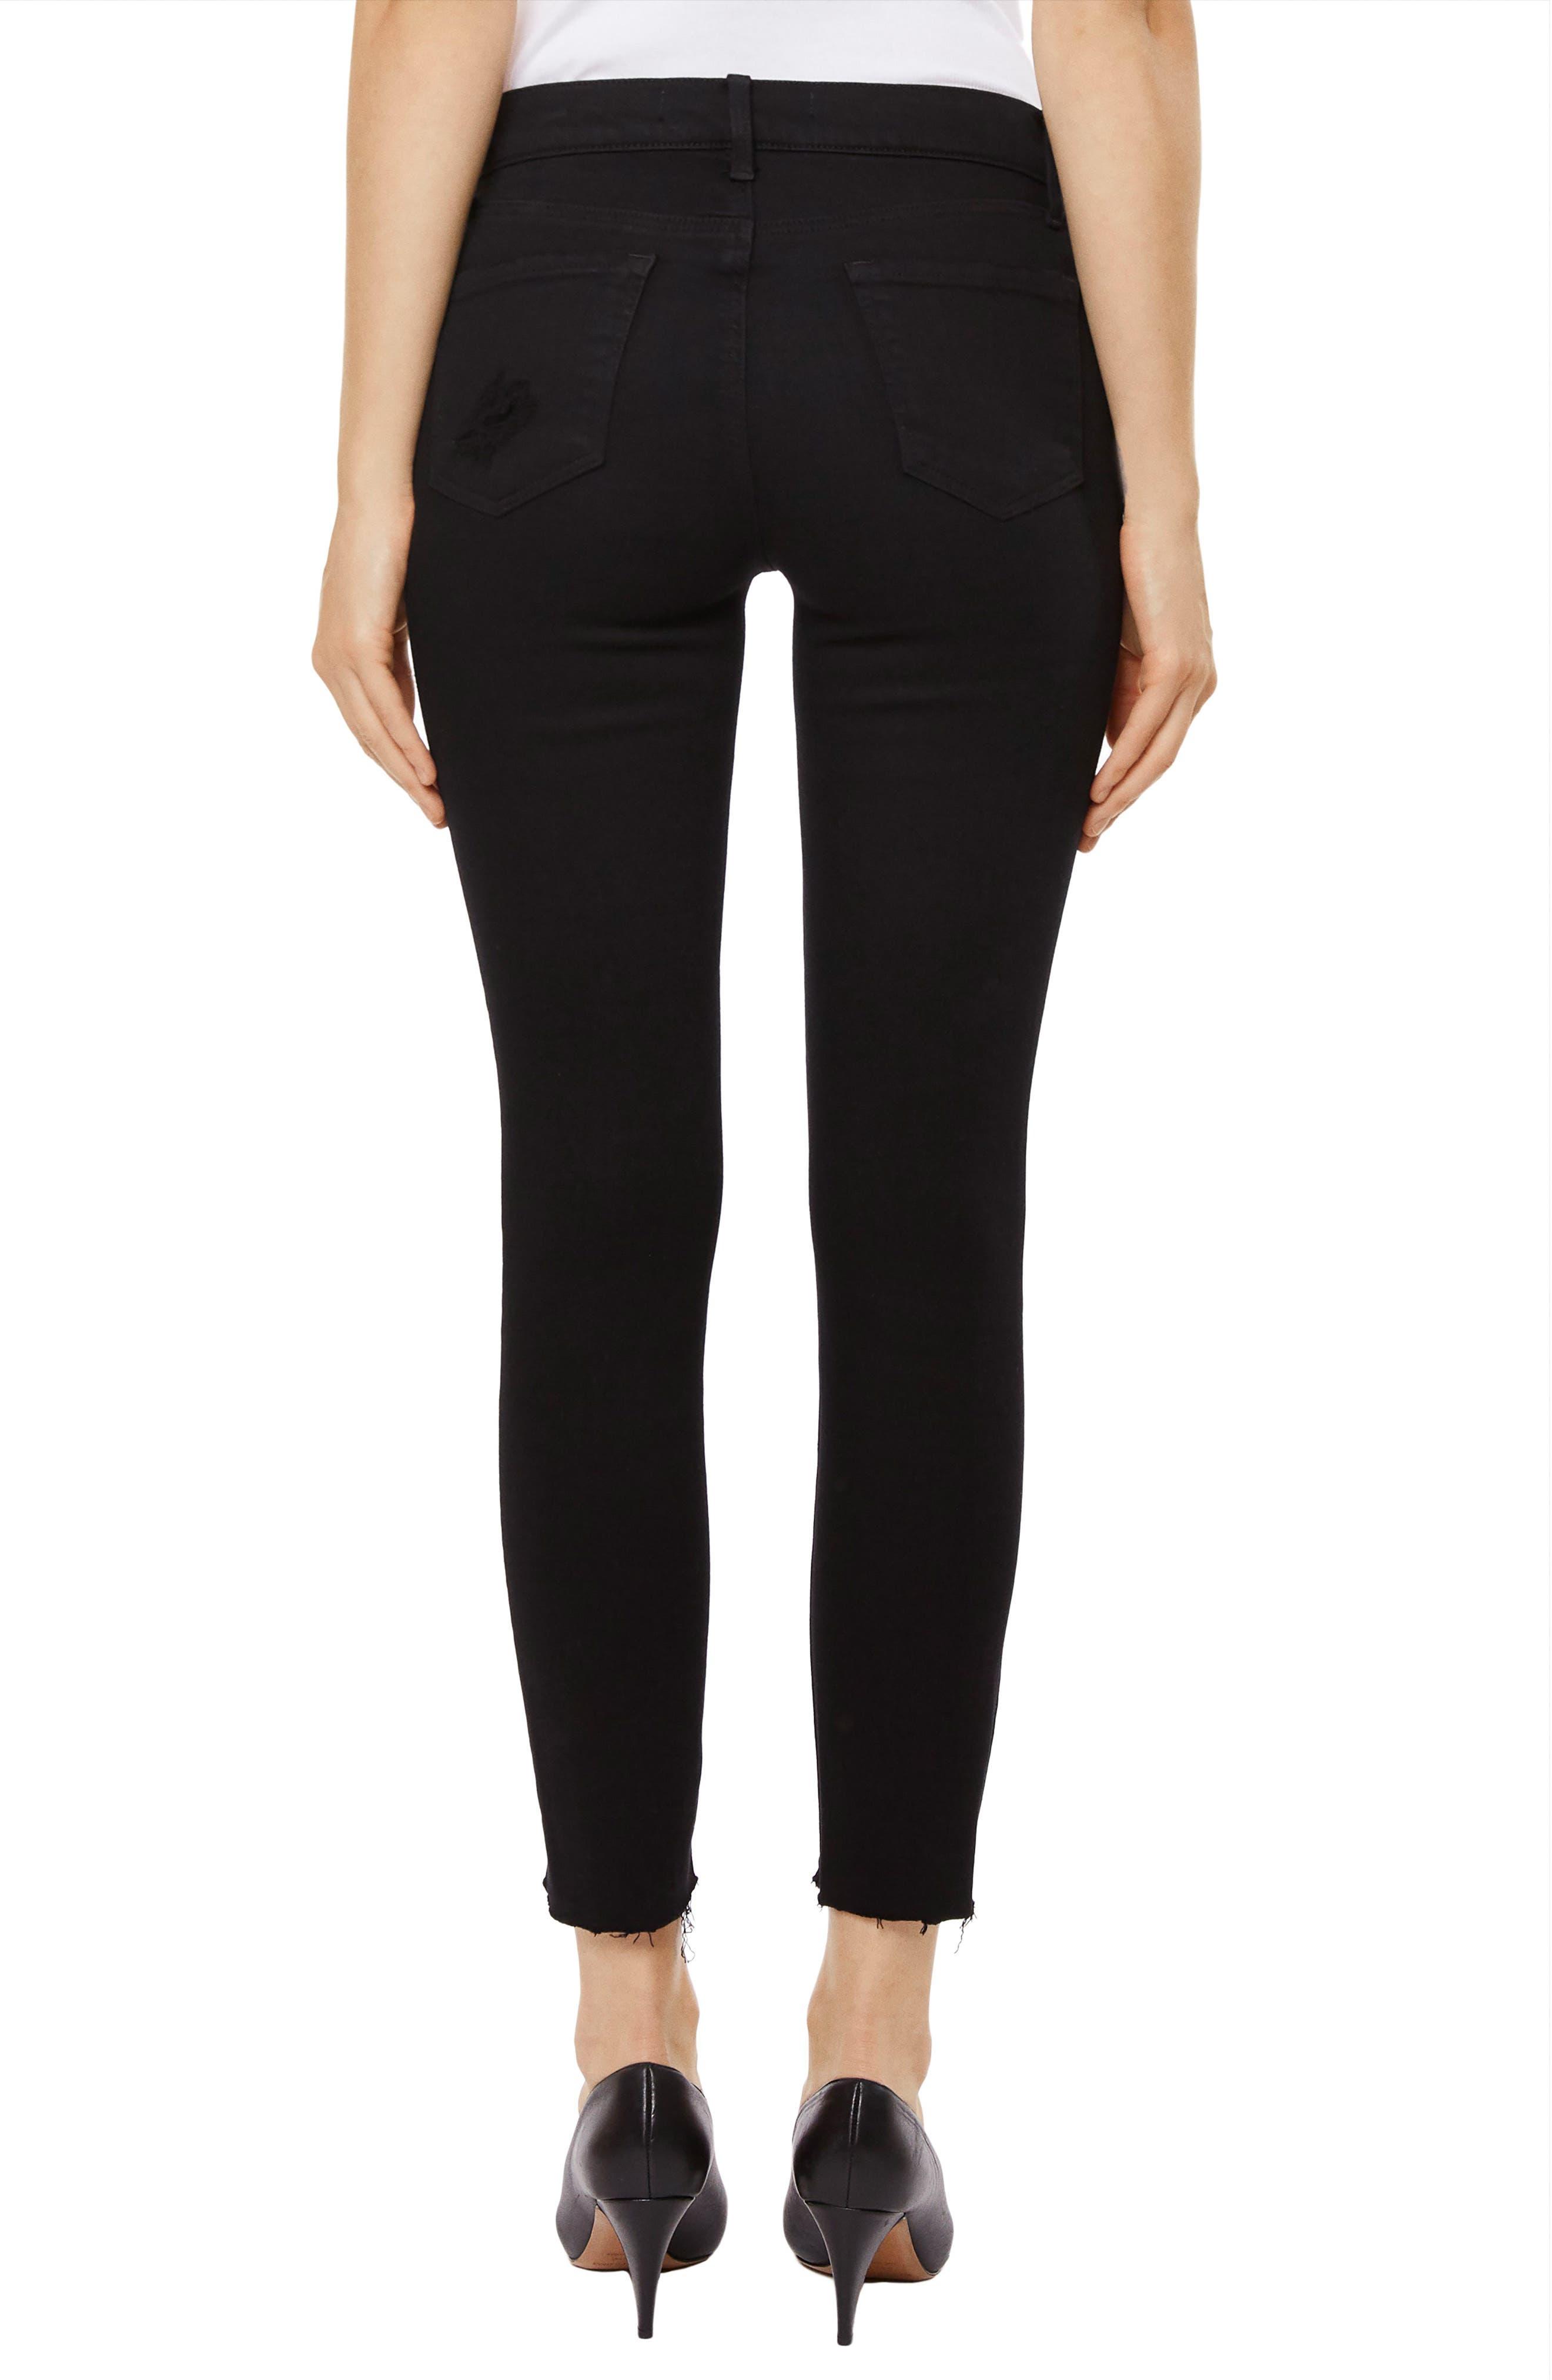 835 Capri Skinny Jeans,                             Alternate thumbnail 2, color,                             Overexposure